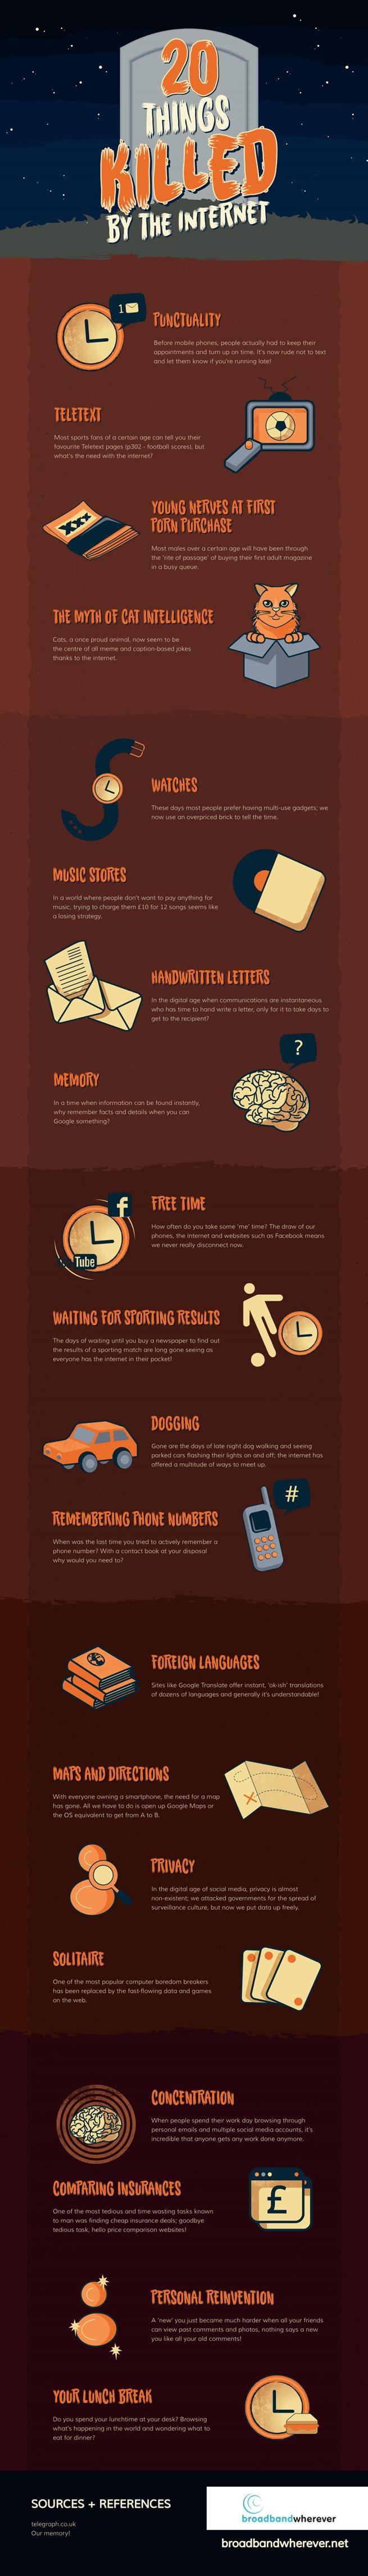 20 cosas que Internet se ha cargado #infografia #infographic